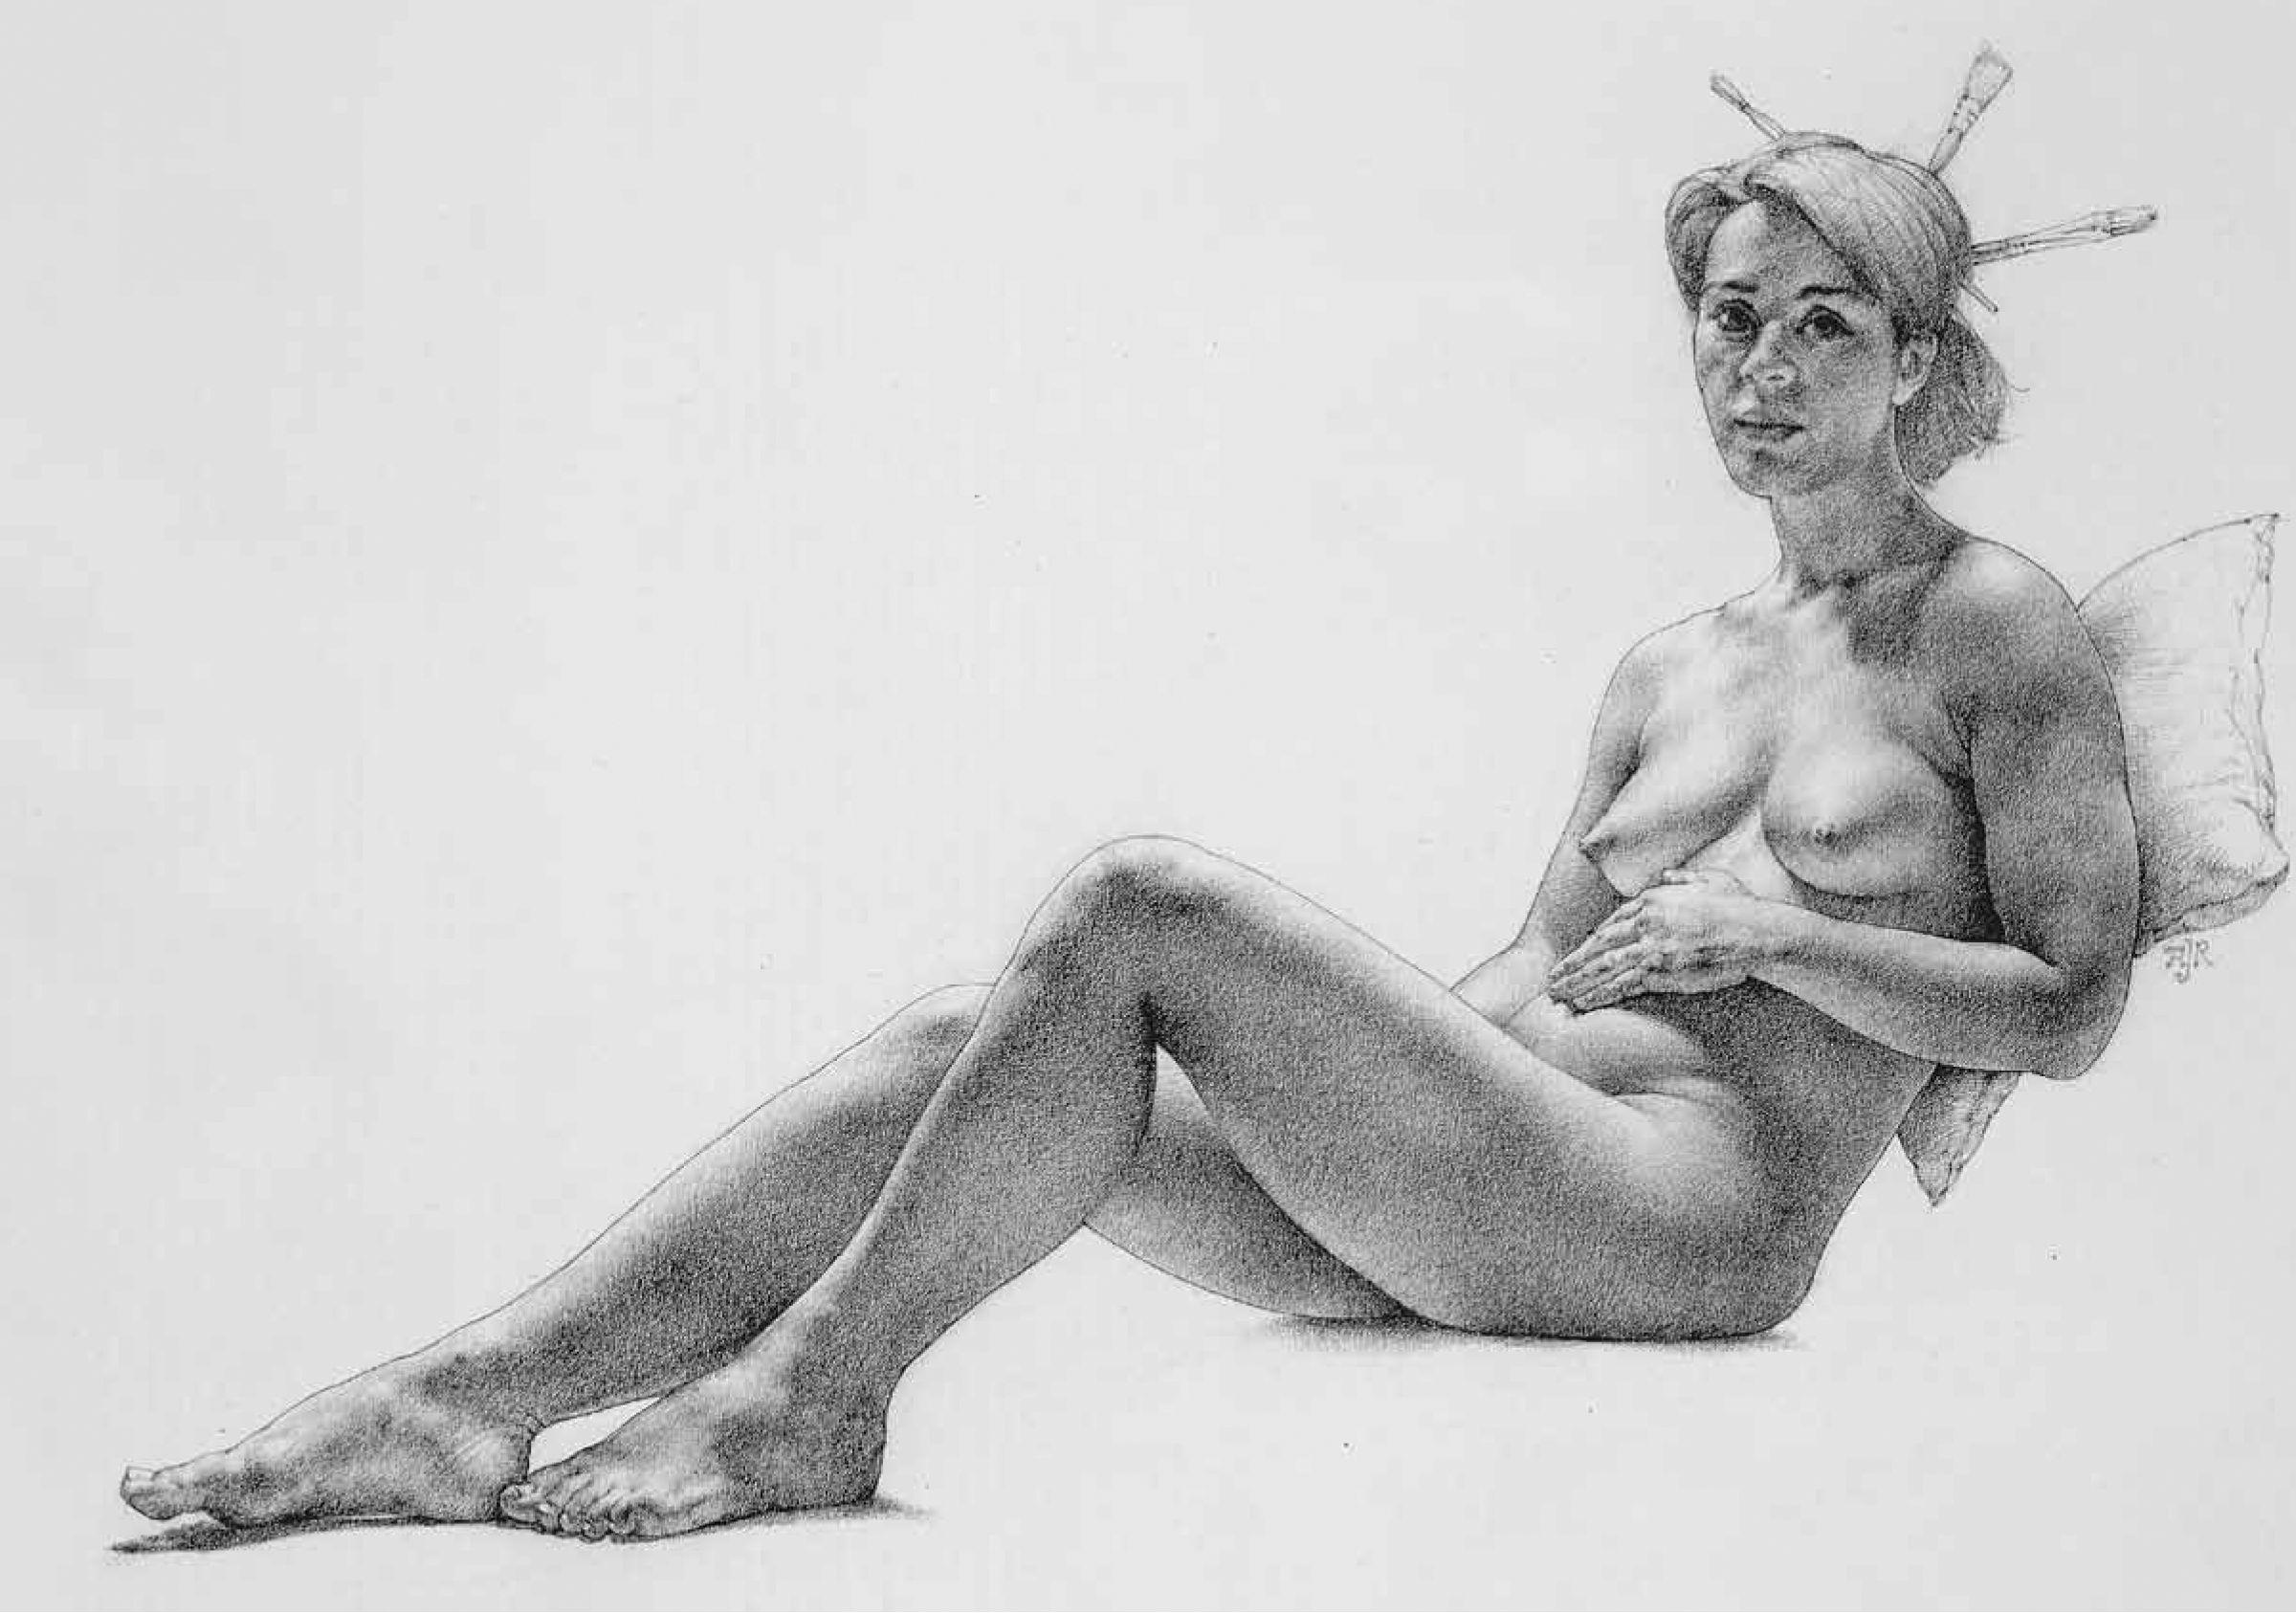 Busty artistic nude ladies